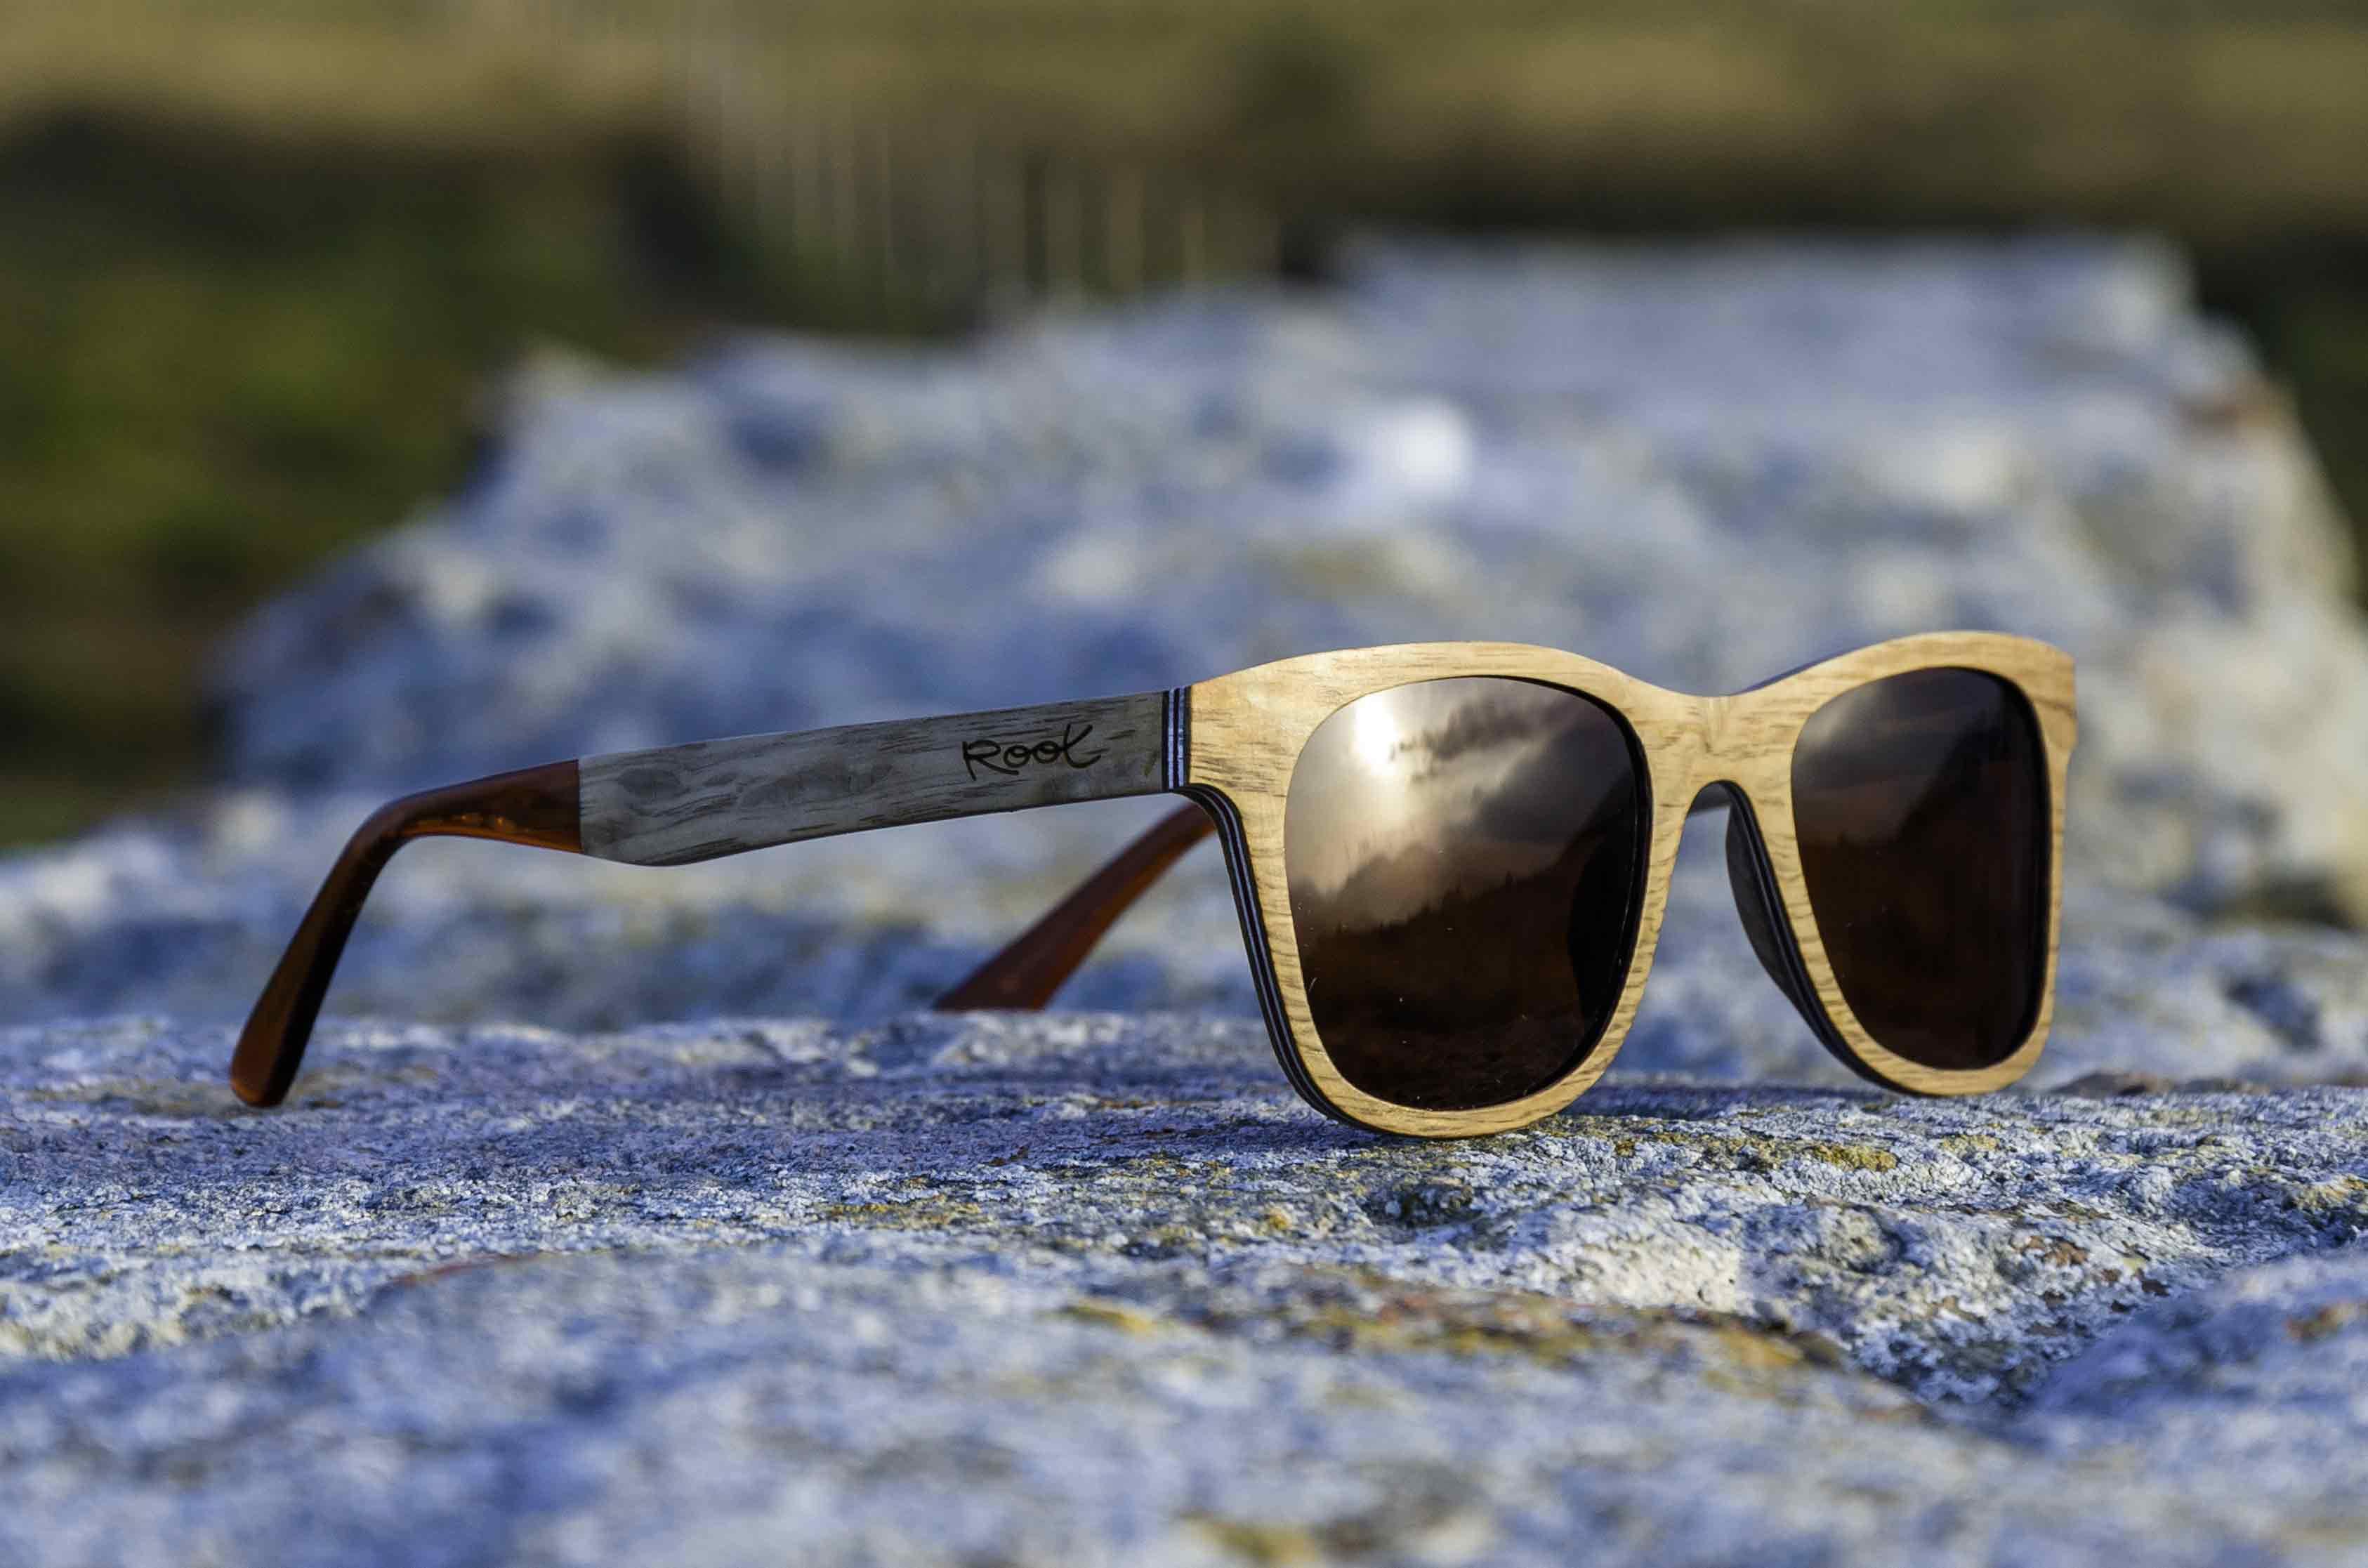 Root Wooden Sunglasses New Aluminized Wood Sunglasses